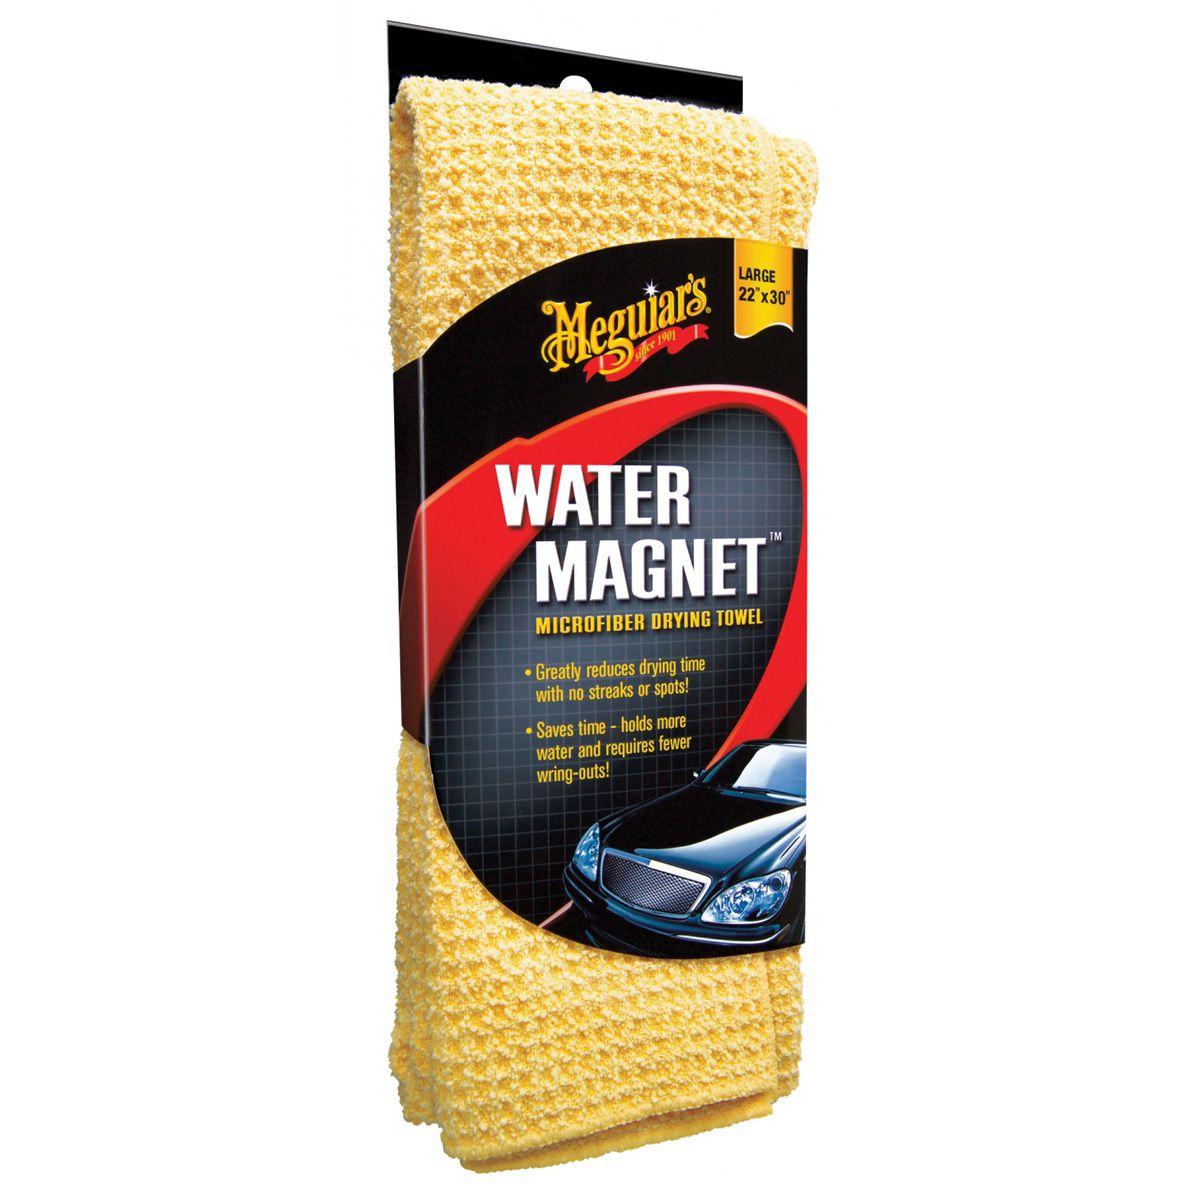 Toalha Para Enxugar Amarela Meguiars Water Magnet X2000